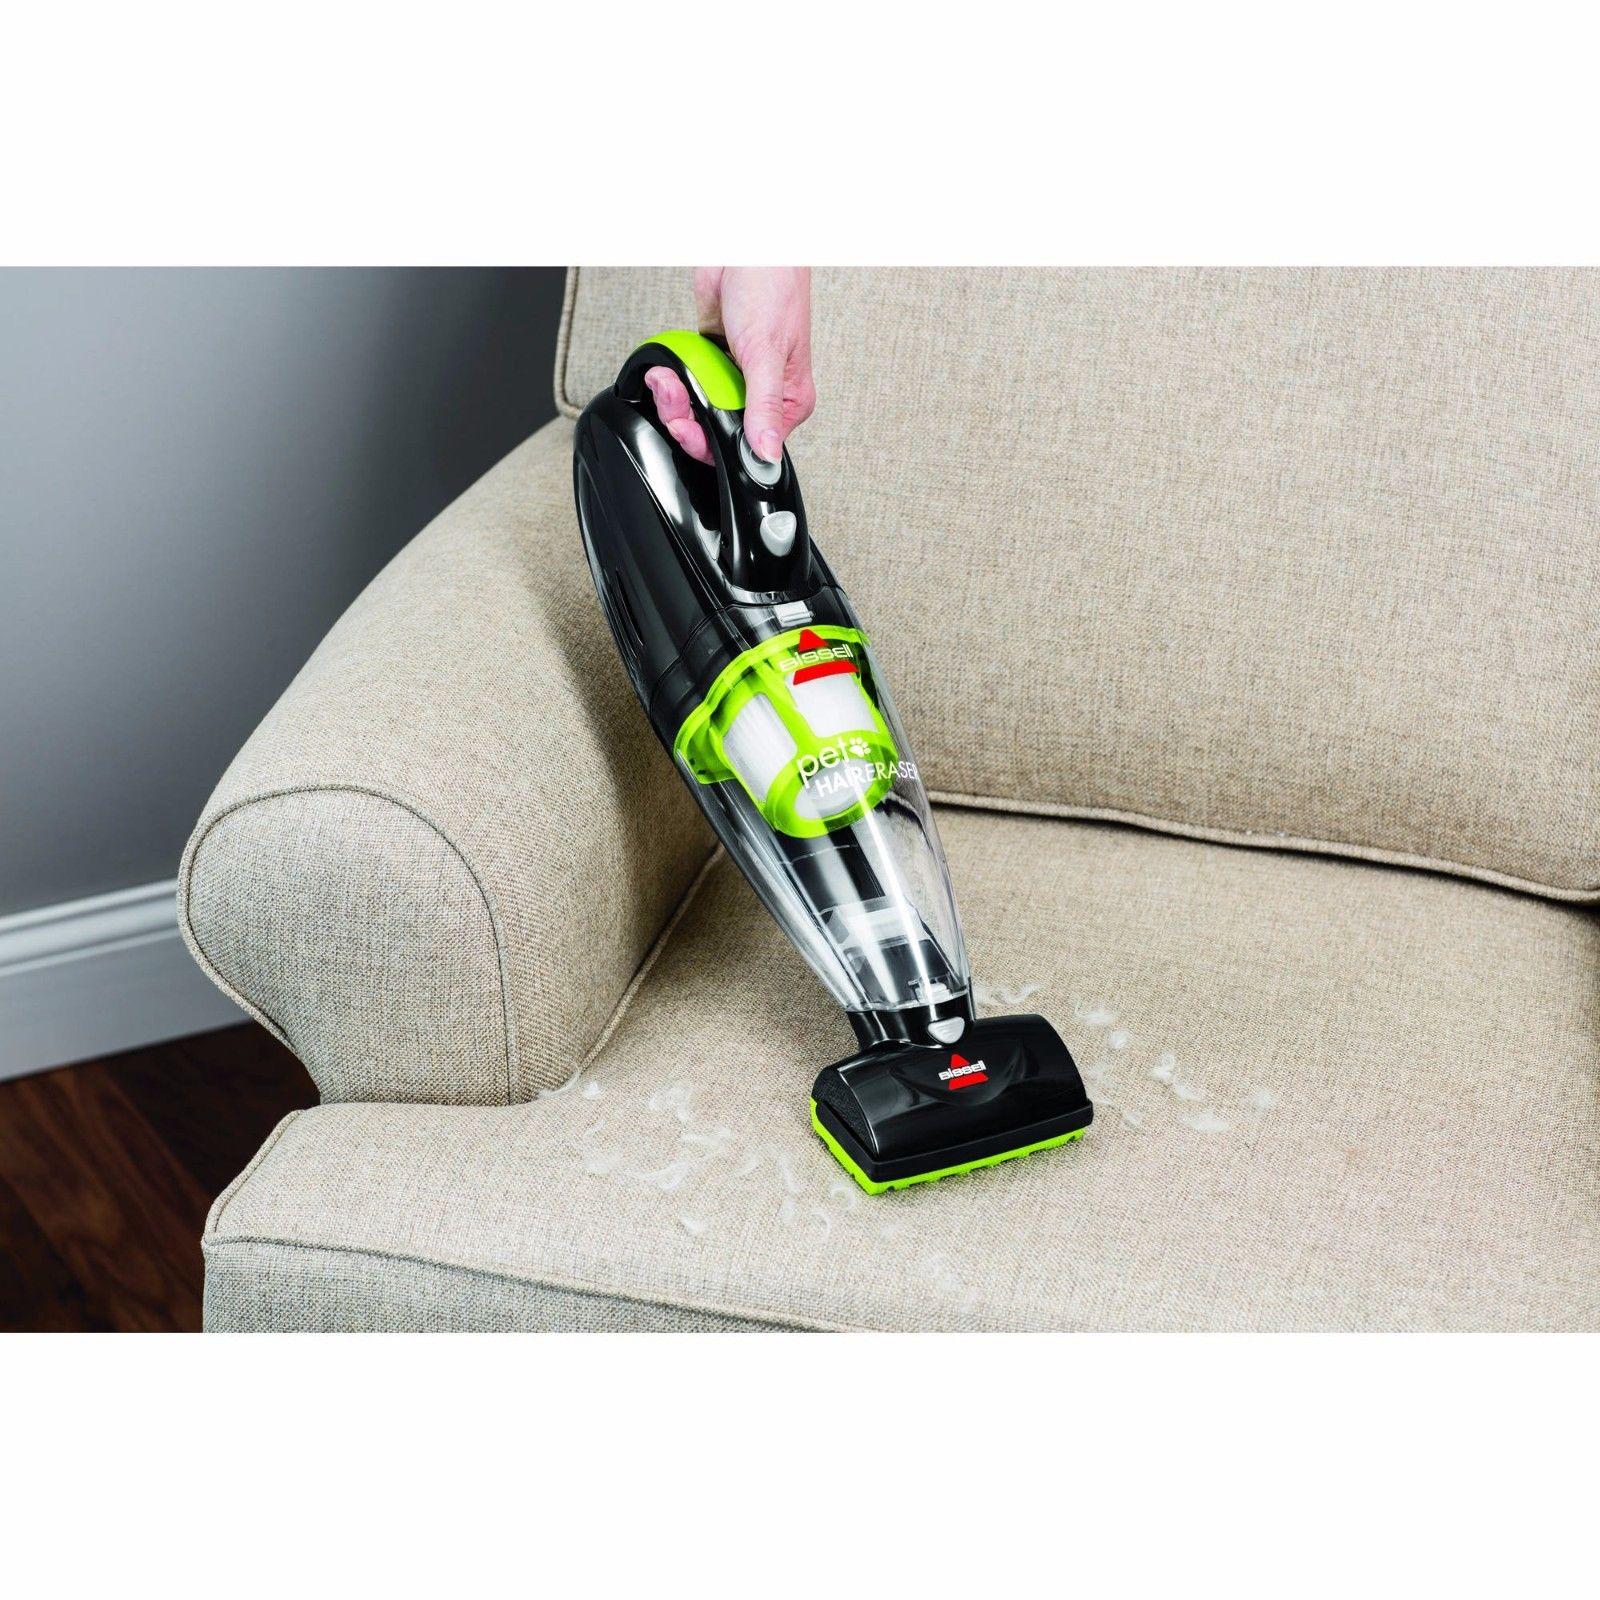 Cordless Hand Vacuum Bissell Pet